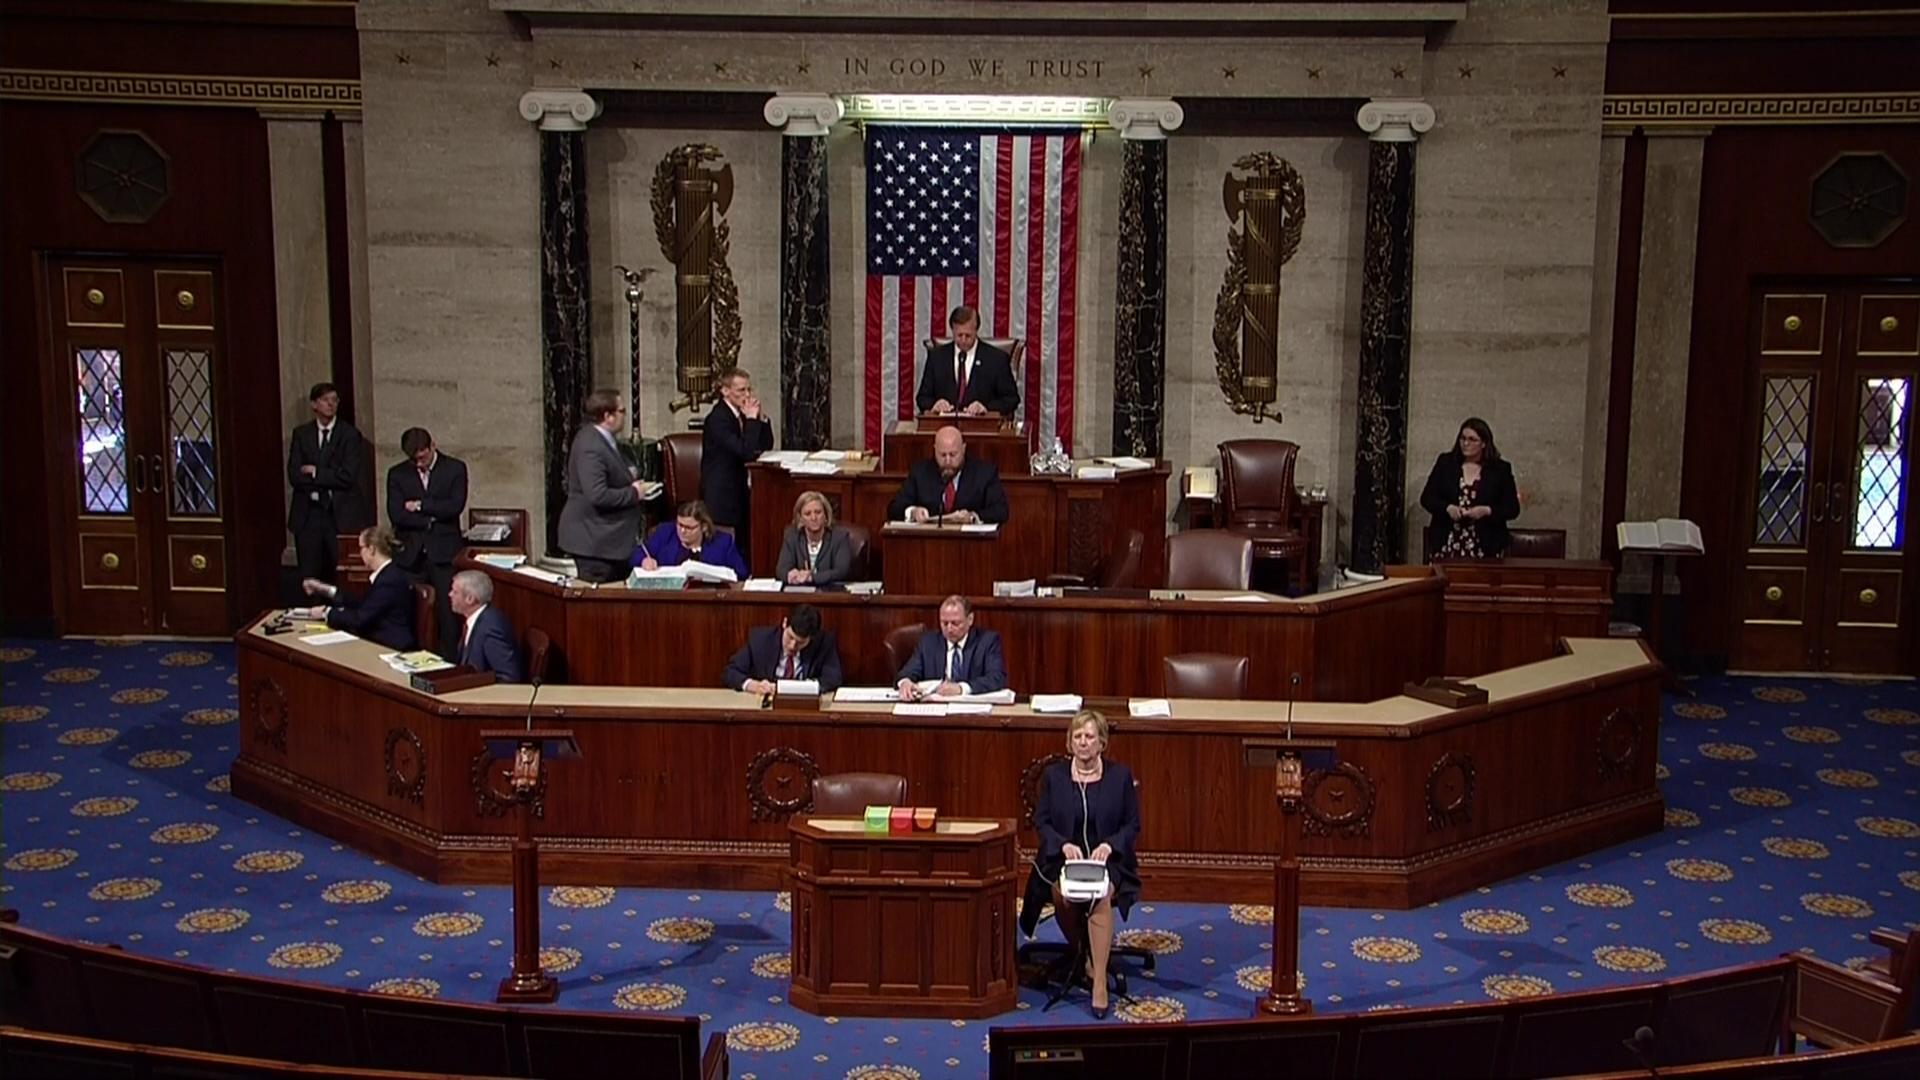 House Passes Bill Combat Online Trafficking 388 25 Feb 27 2018  # Muebles Loam Canada De Gomez